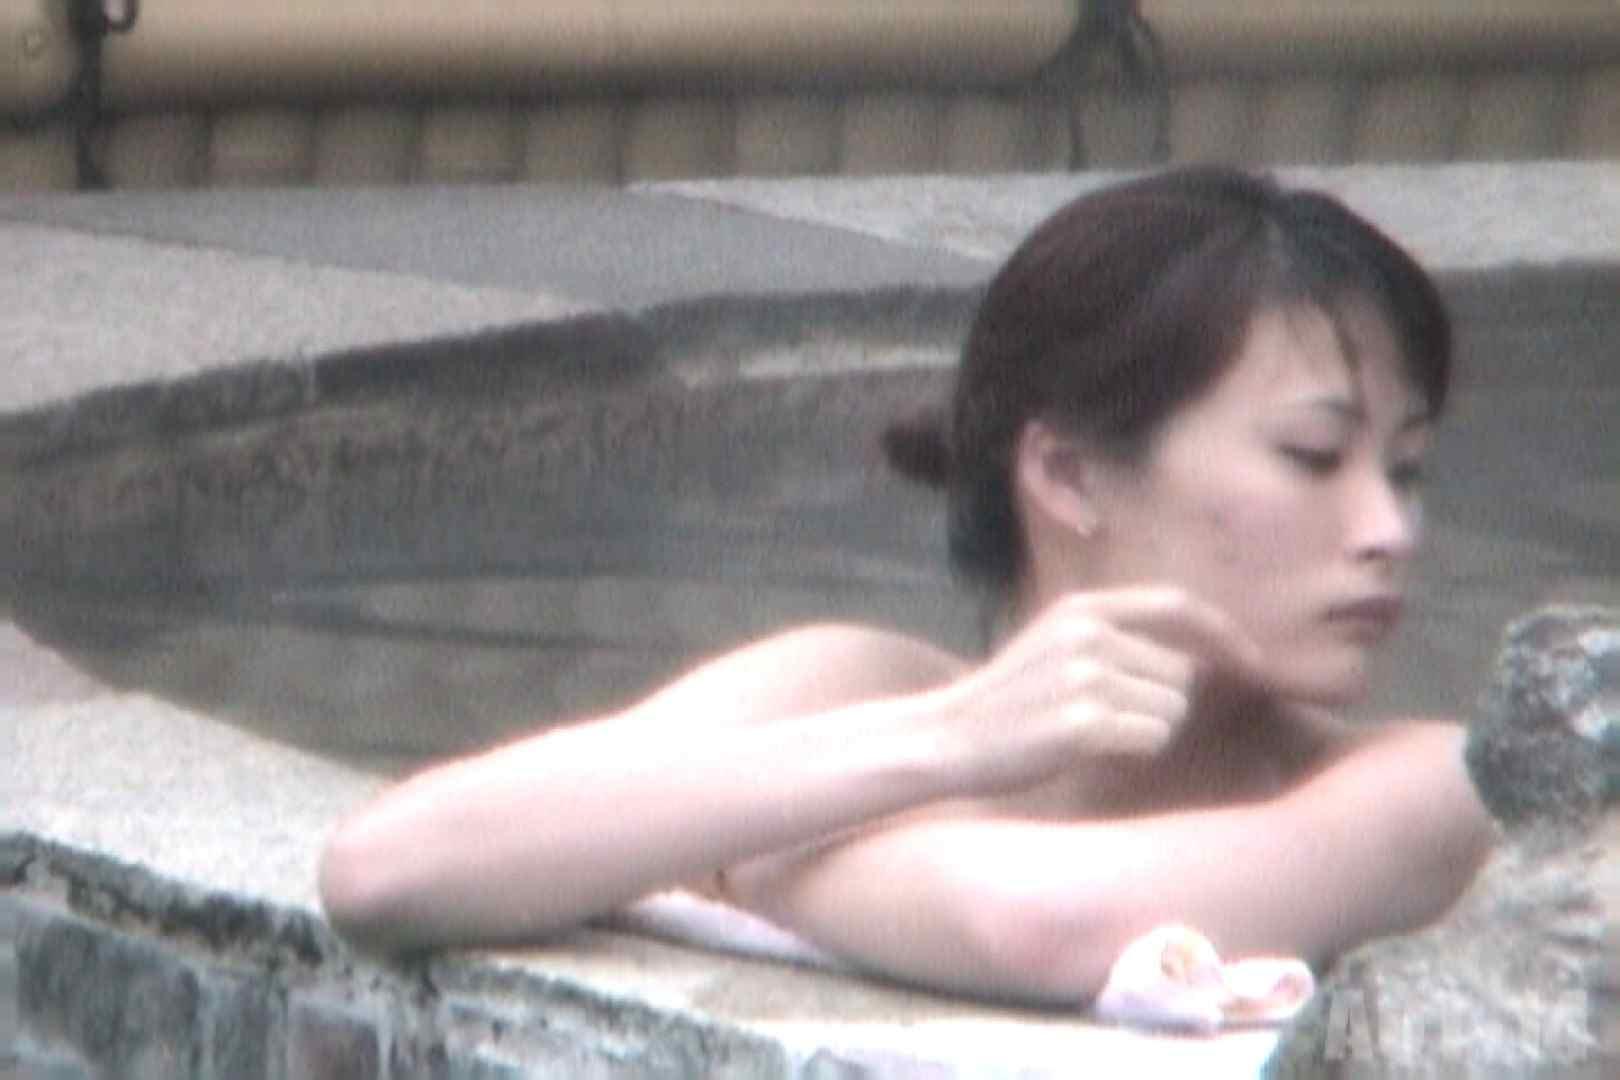 Aquaな露天風呂Vol.822 OLのエロ生活   露天風呂  62連発 16